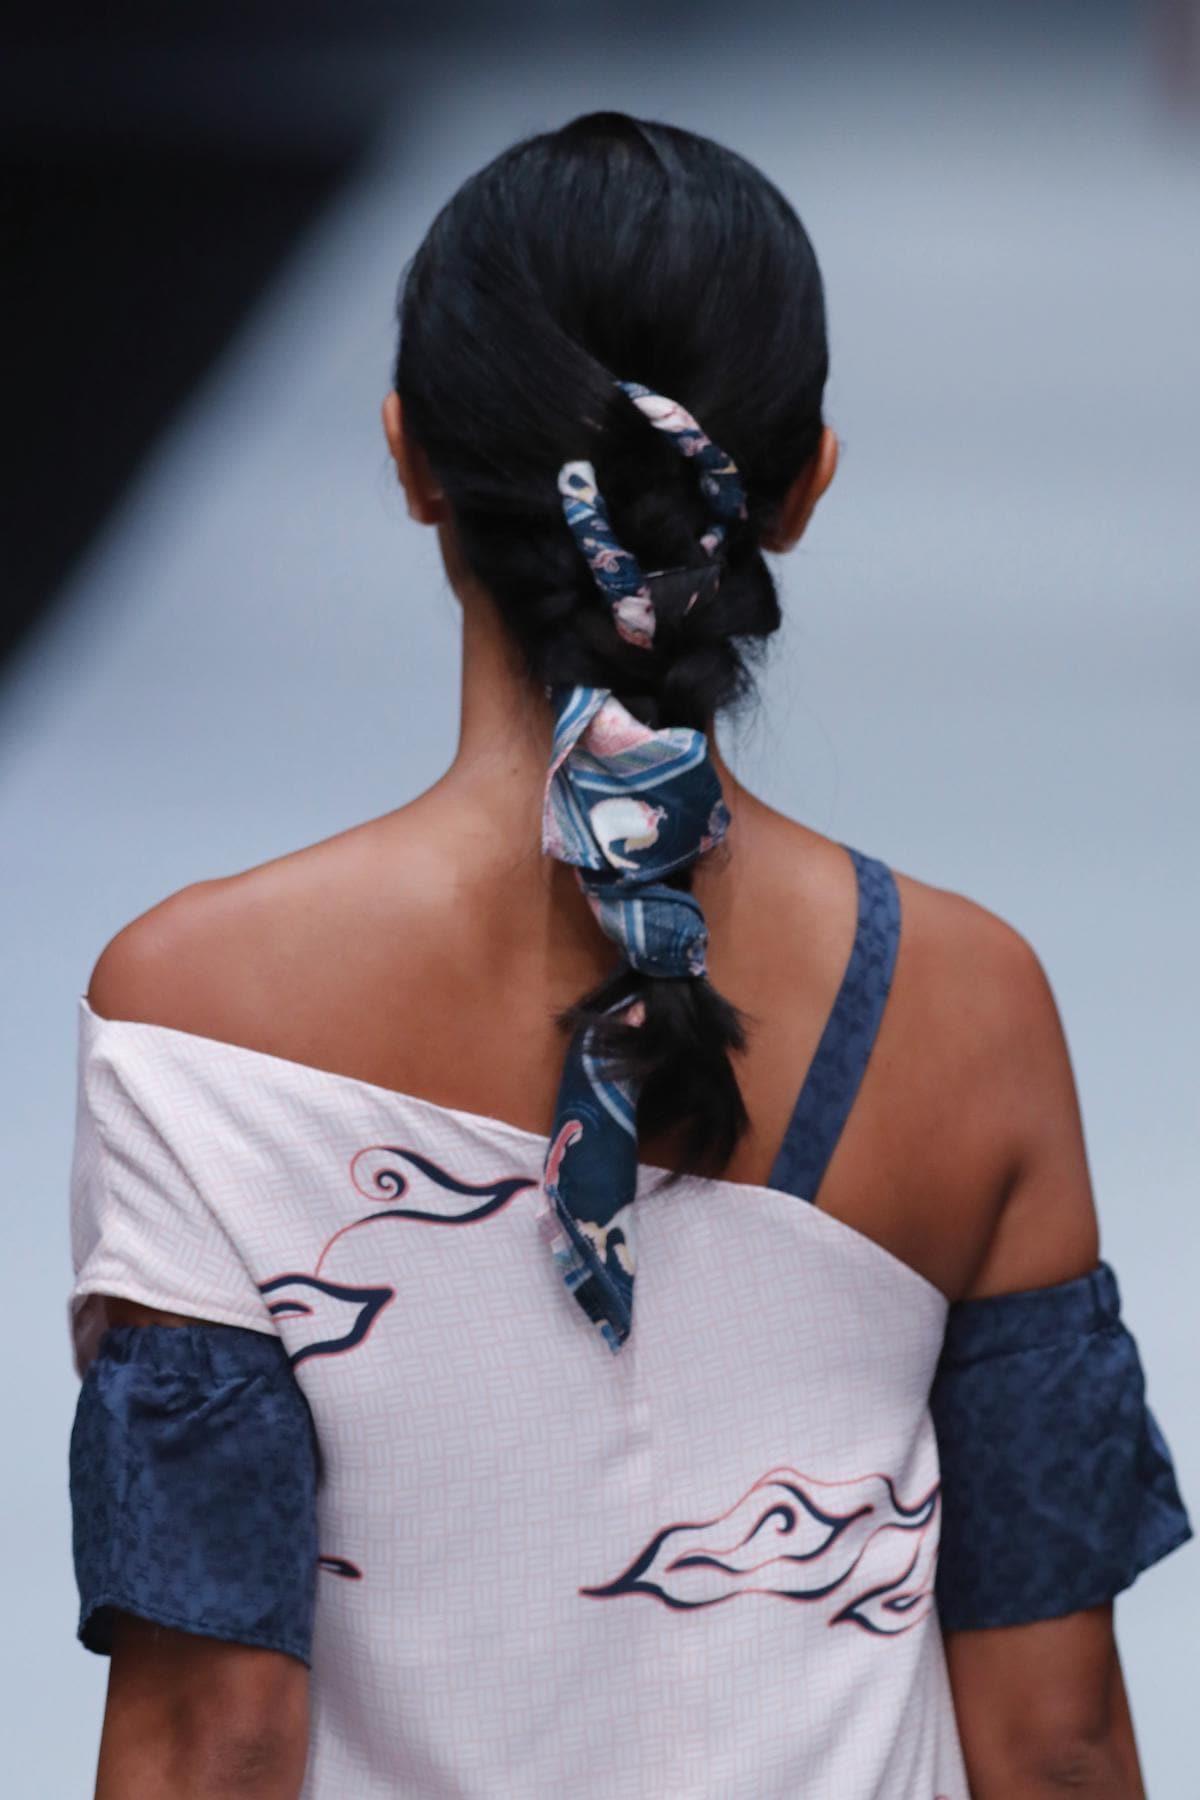 Wanita asia dengan model rambut kepang untuk pesta kepang dengan scarf